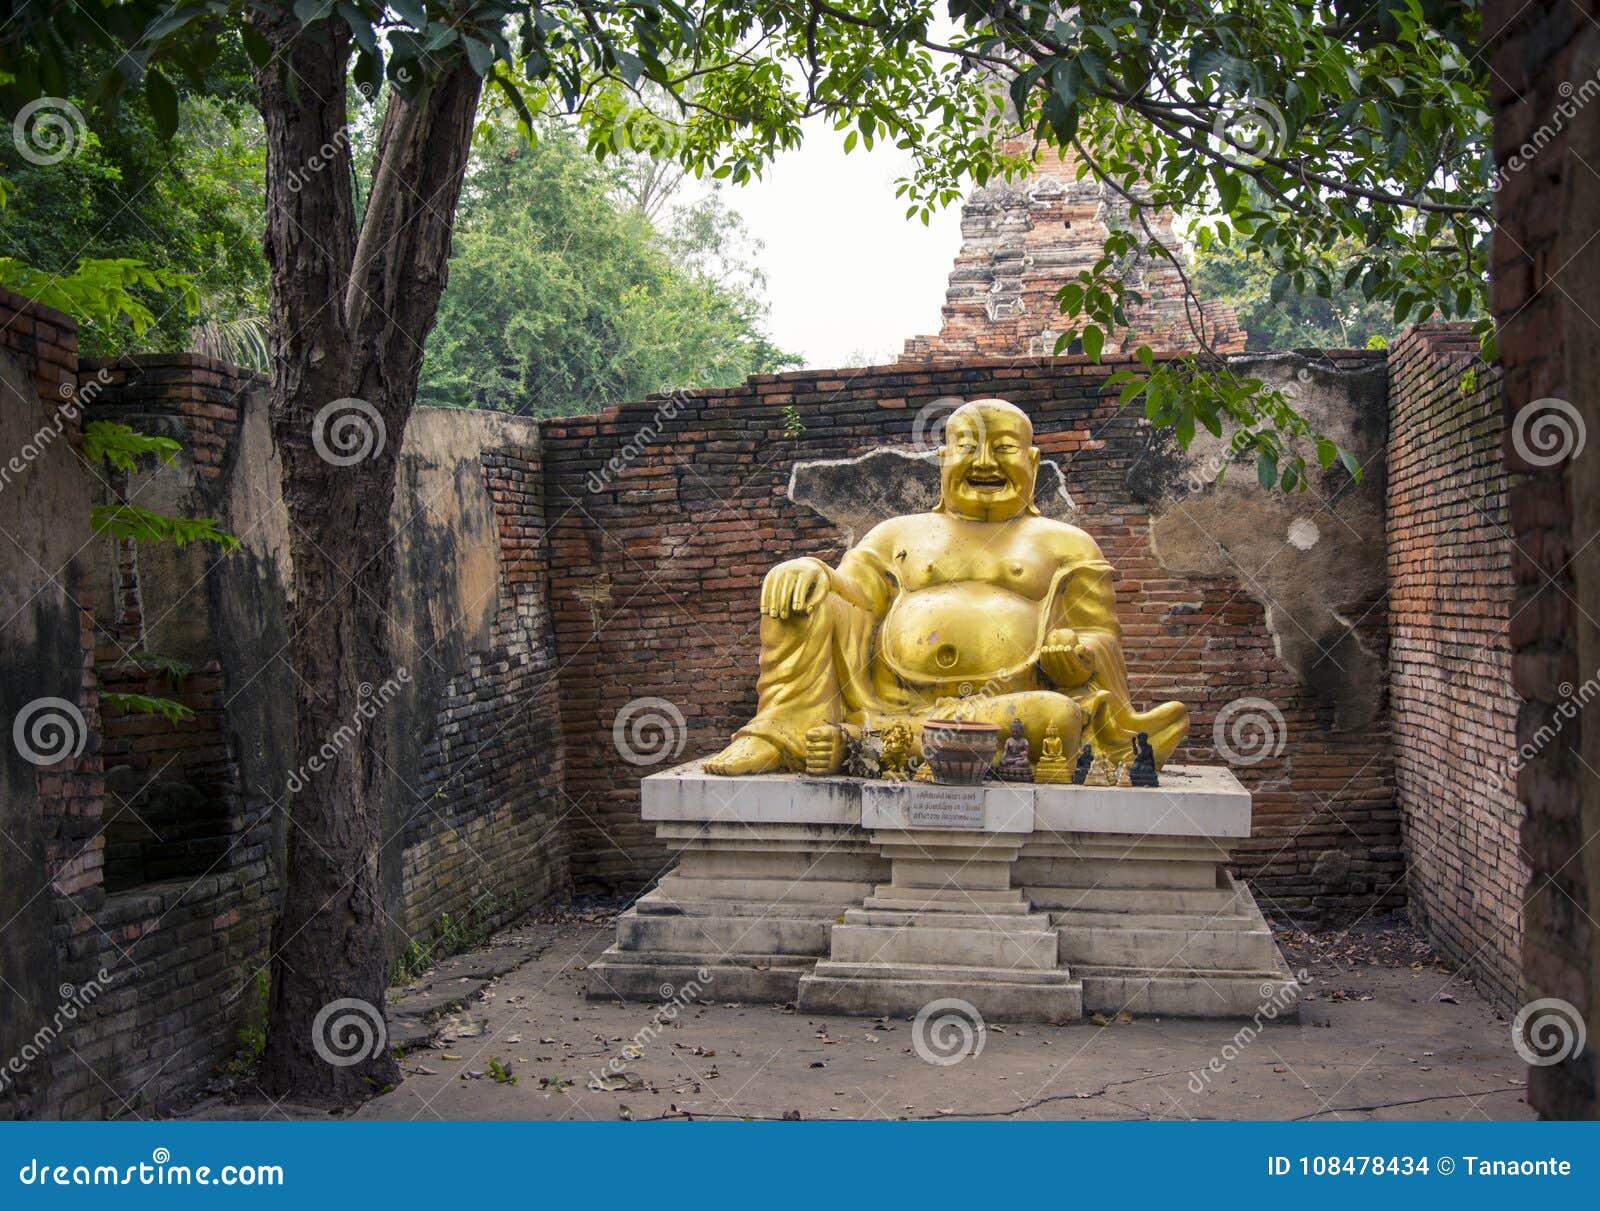 Grosse statue riante de Bouddha chez Wat Phu Khao Thong à Ayutthaya thailand